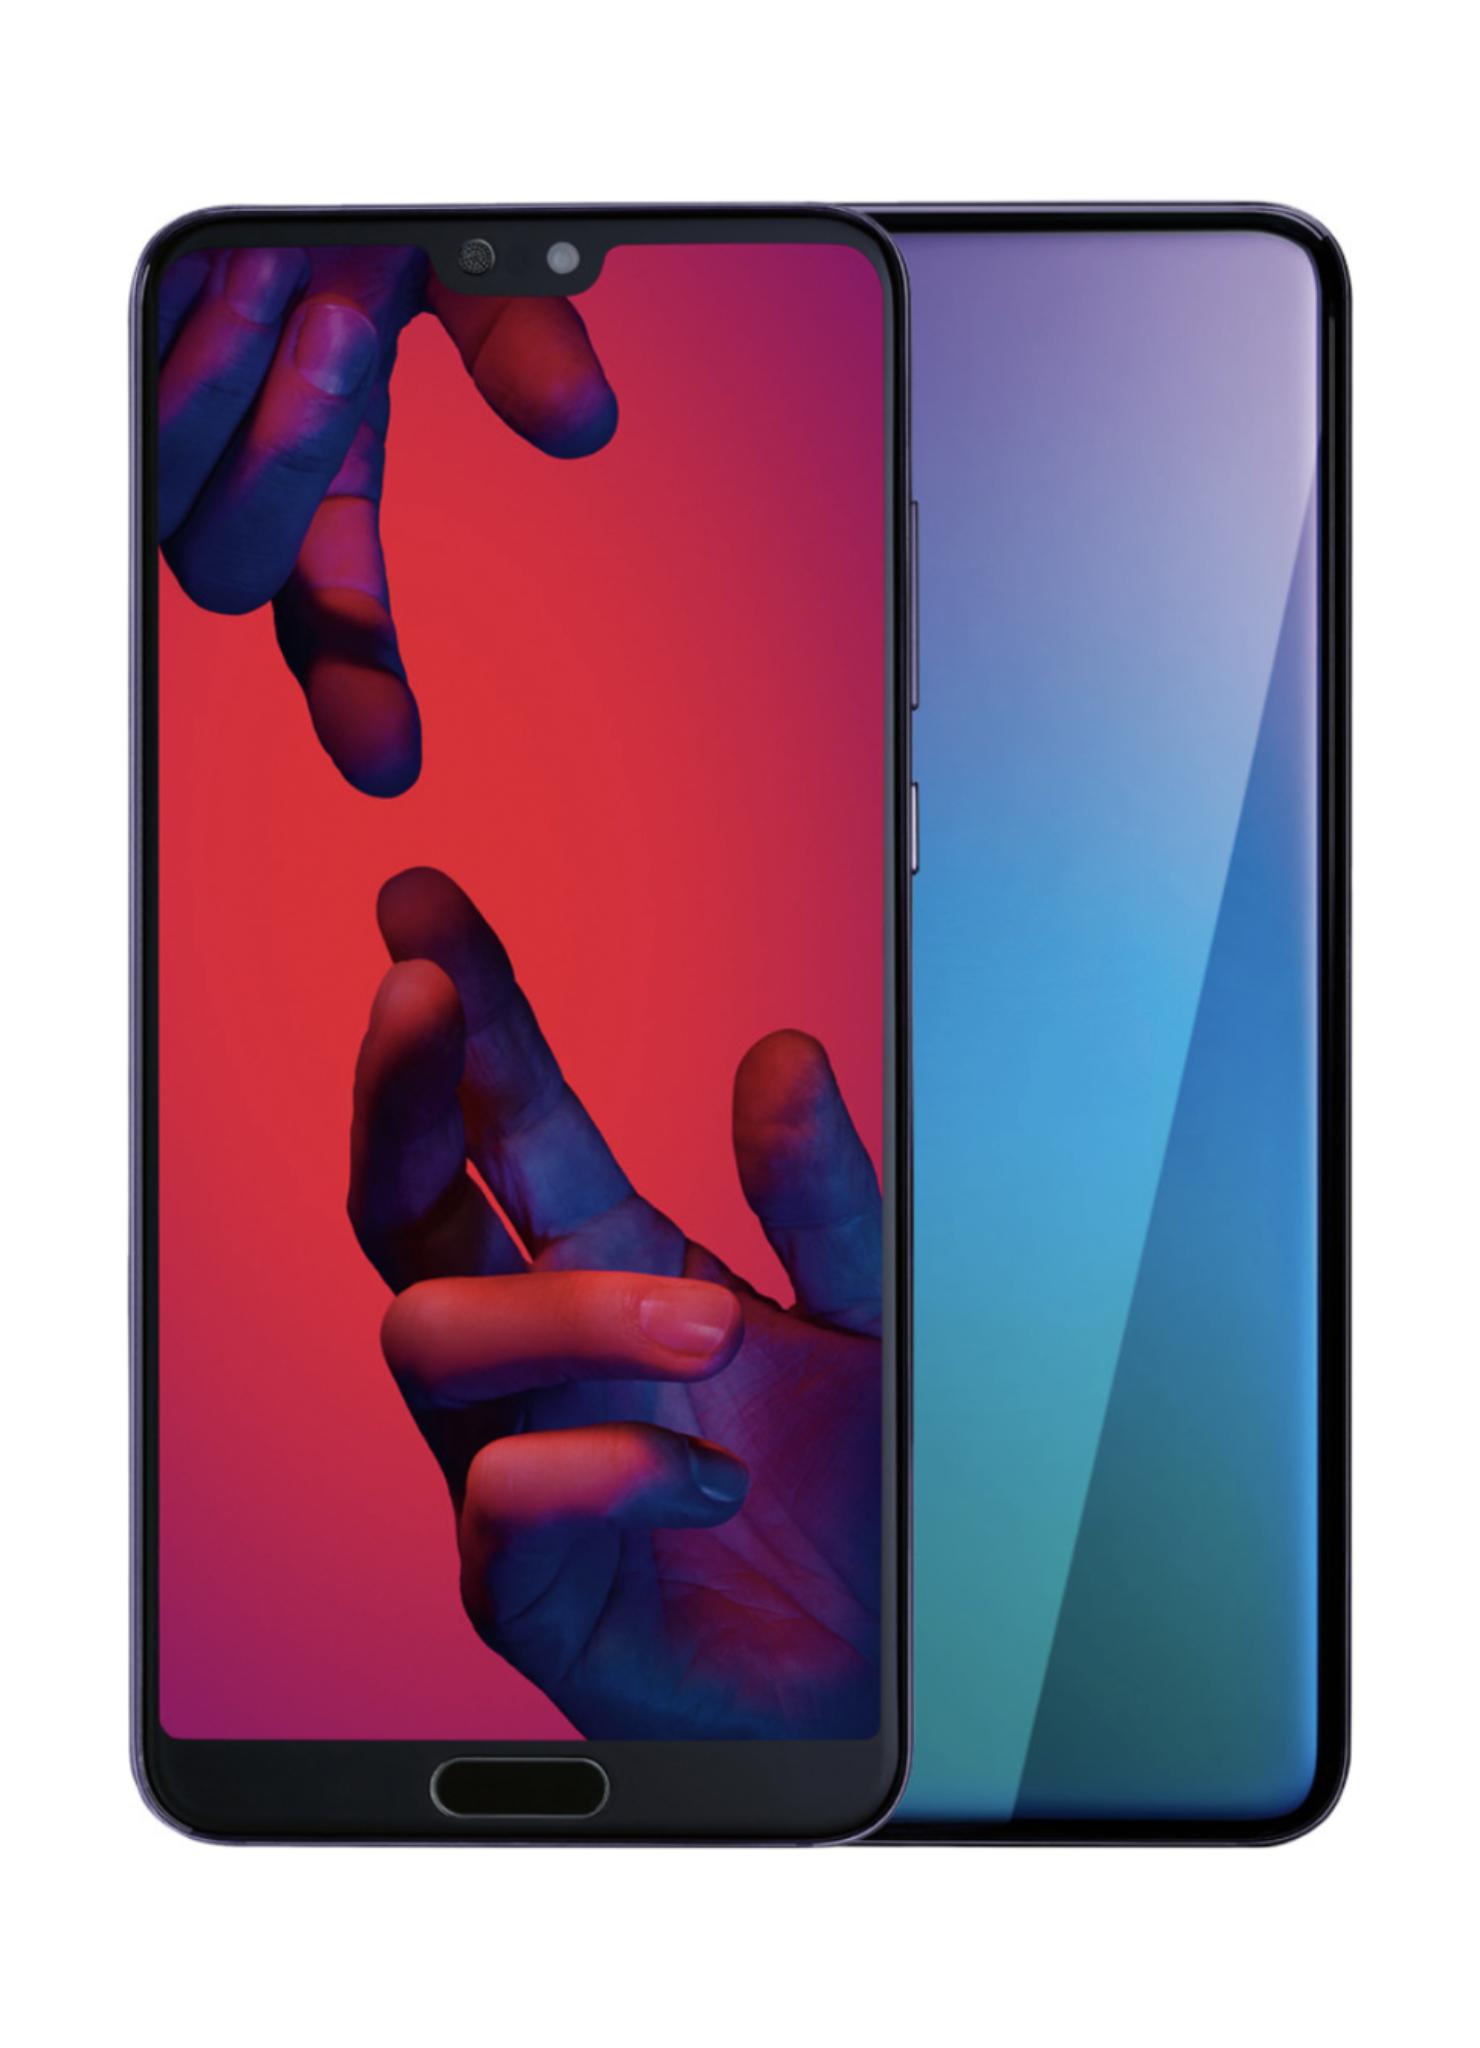 [asgoodasnew] Huawei P20 Pro 128GB Twilight Smartphone Dual-Sim Neuware